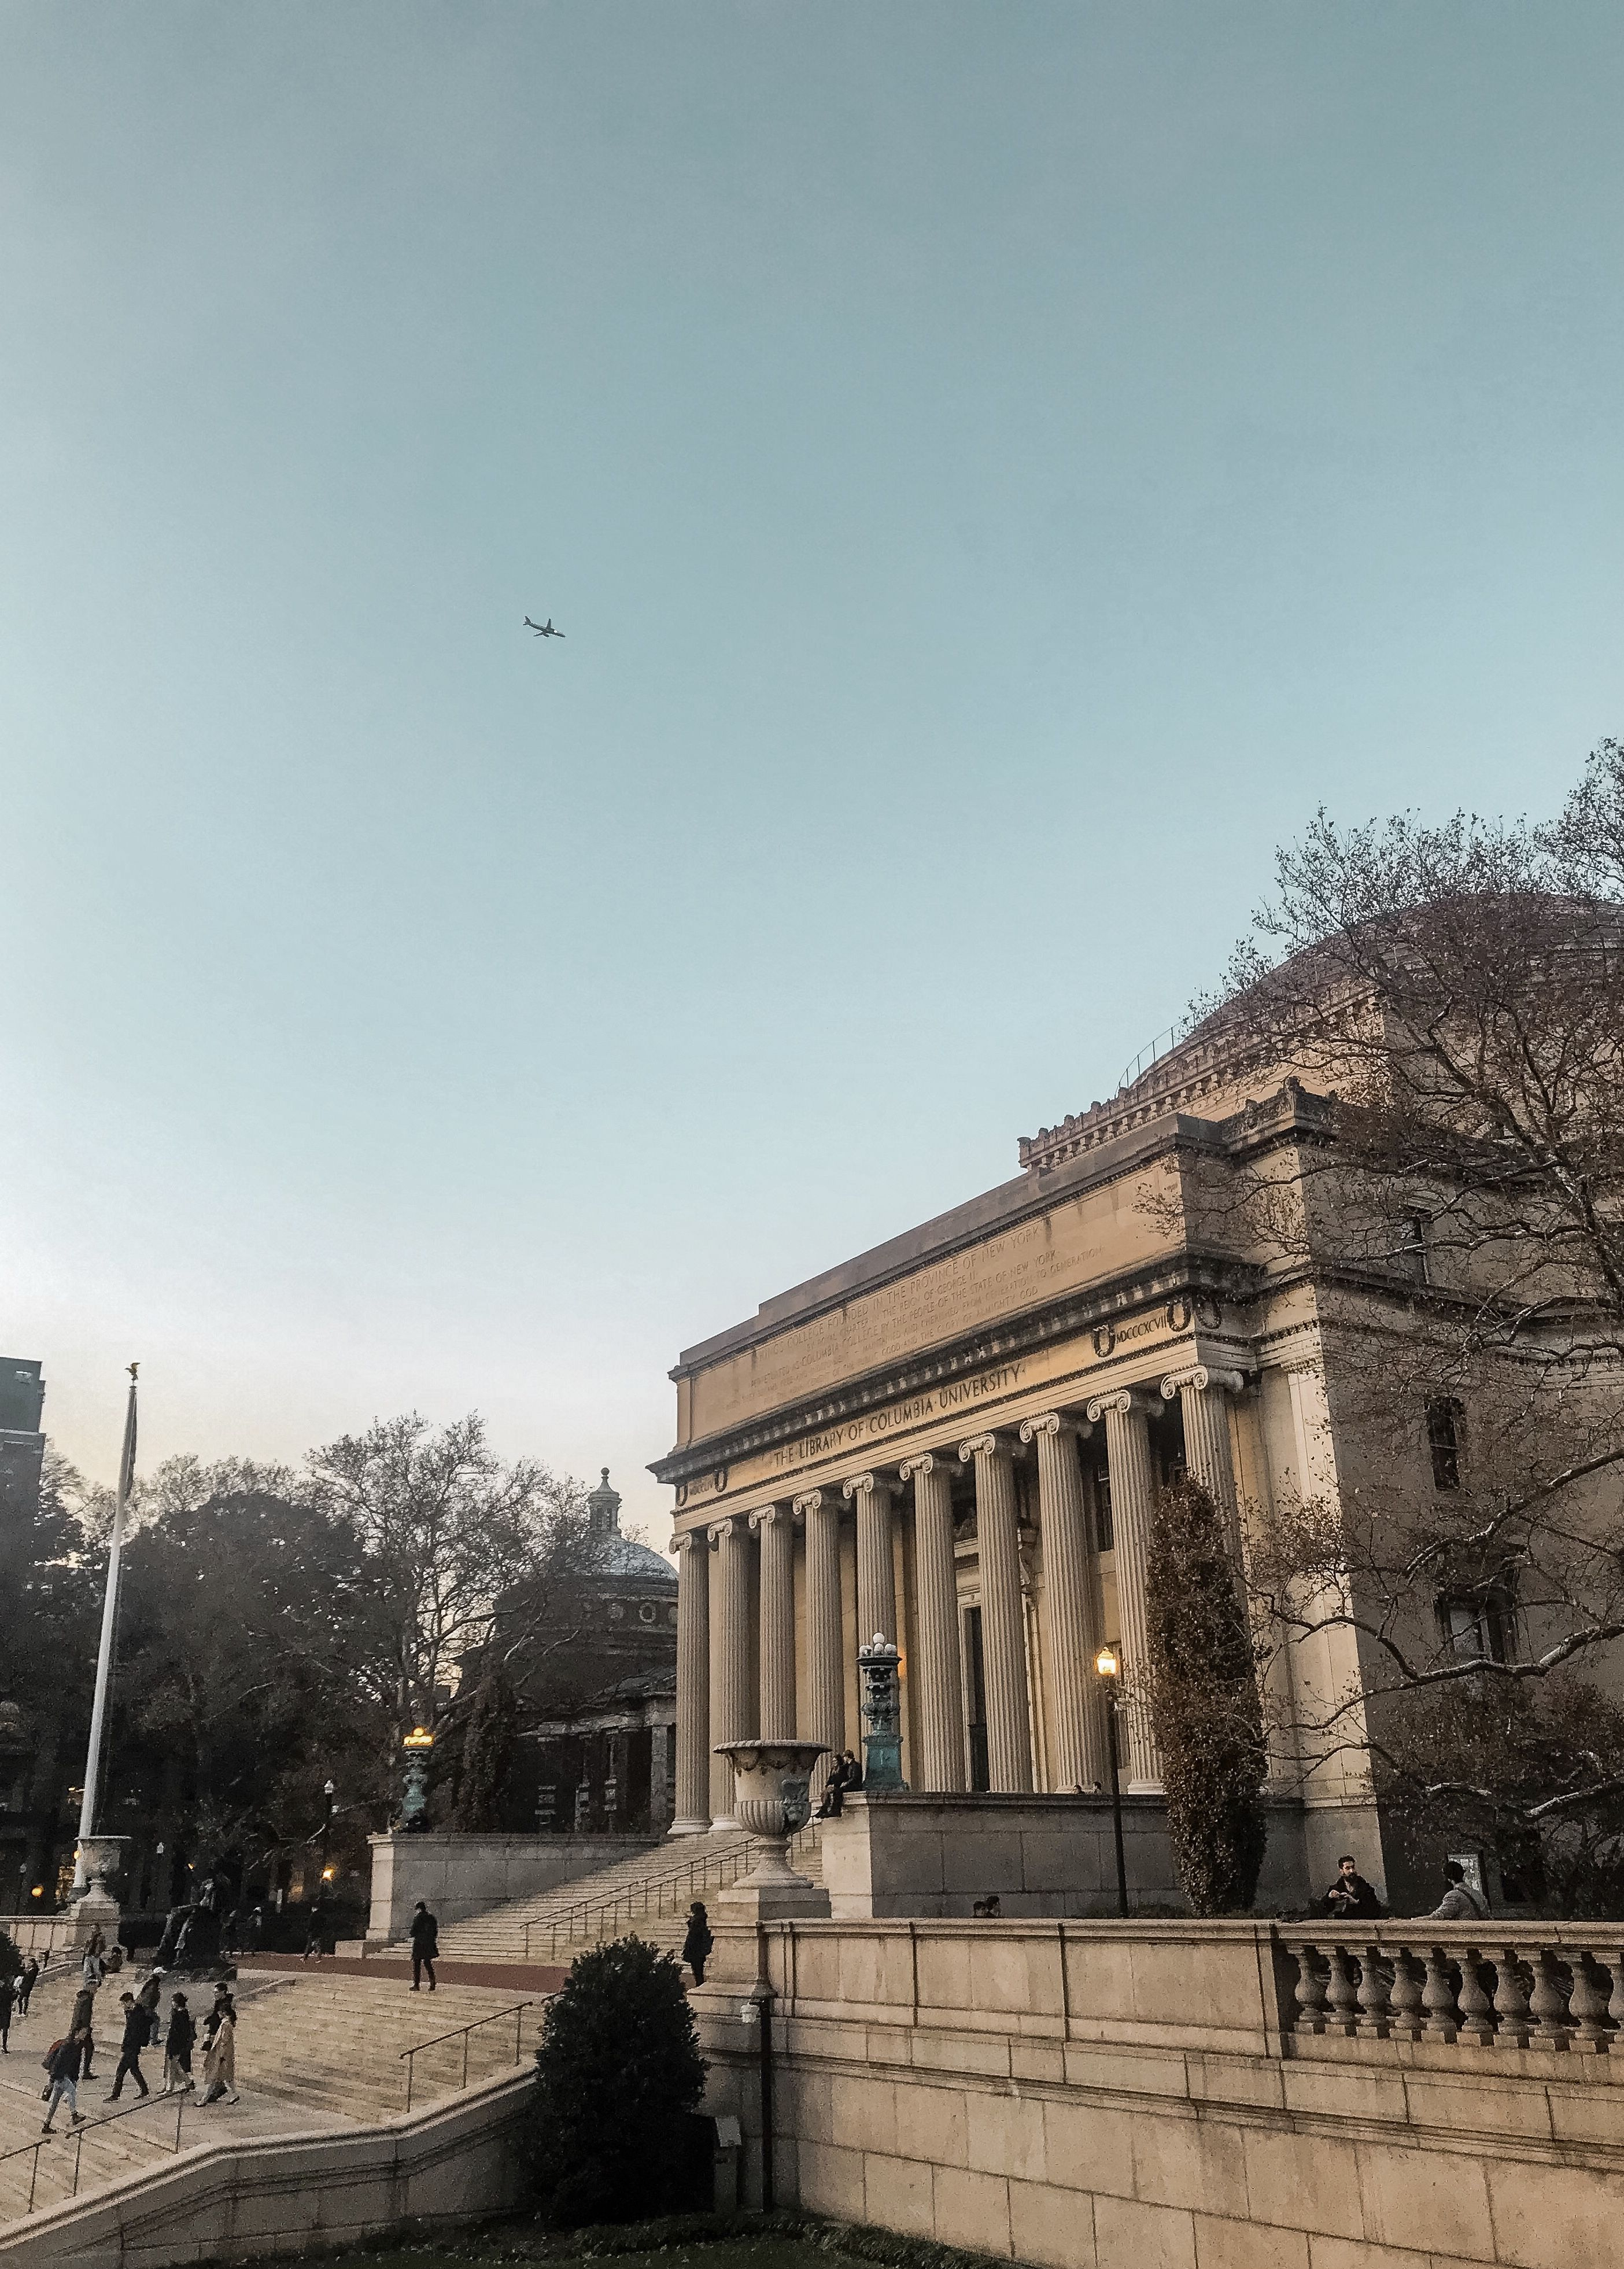 Columbia university in 2020 university architecture